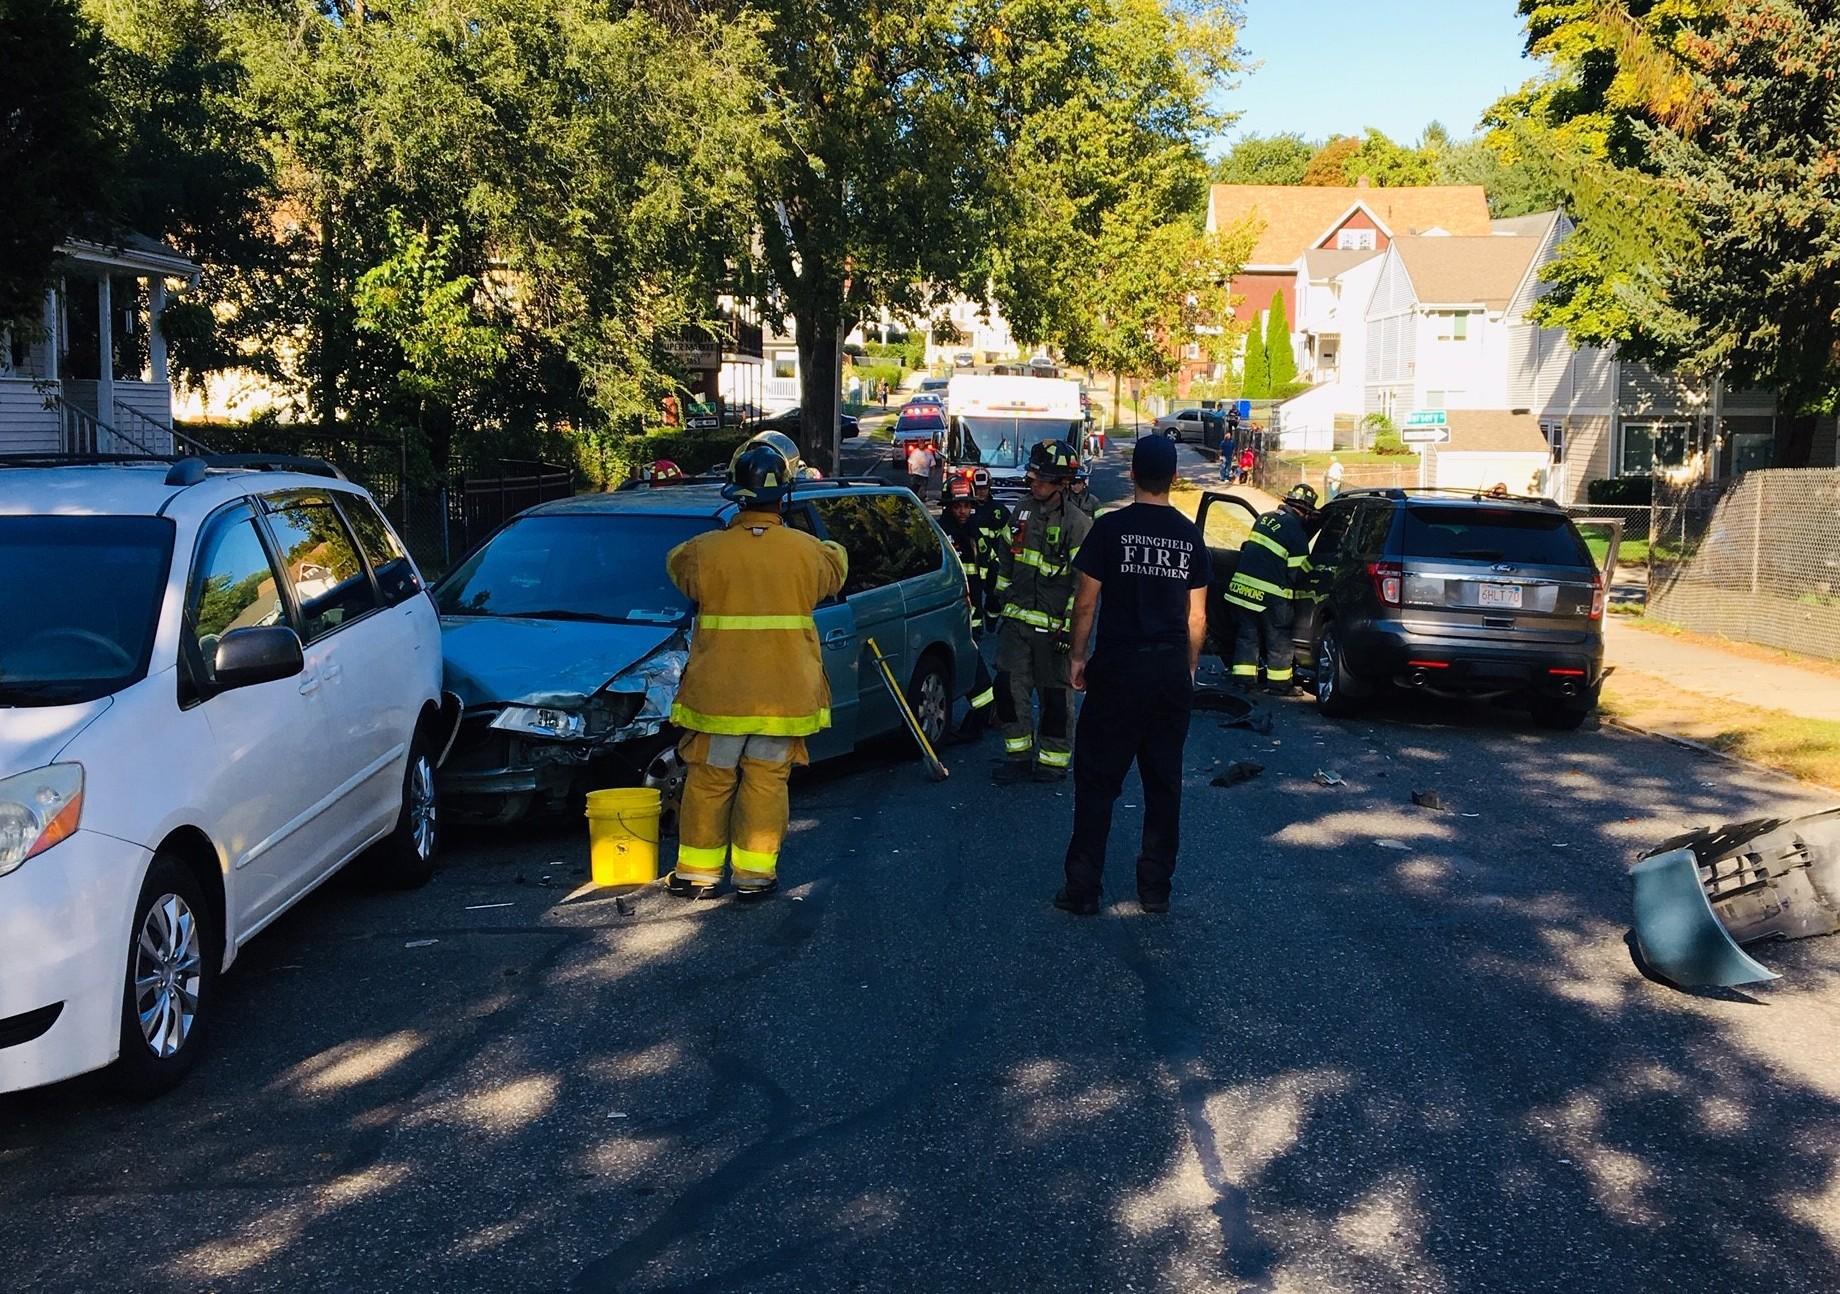 Springfield 3-car crash leaves 2 injured